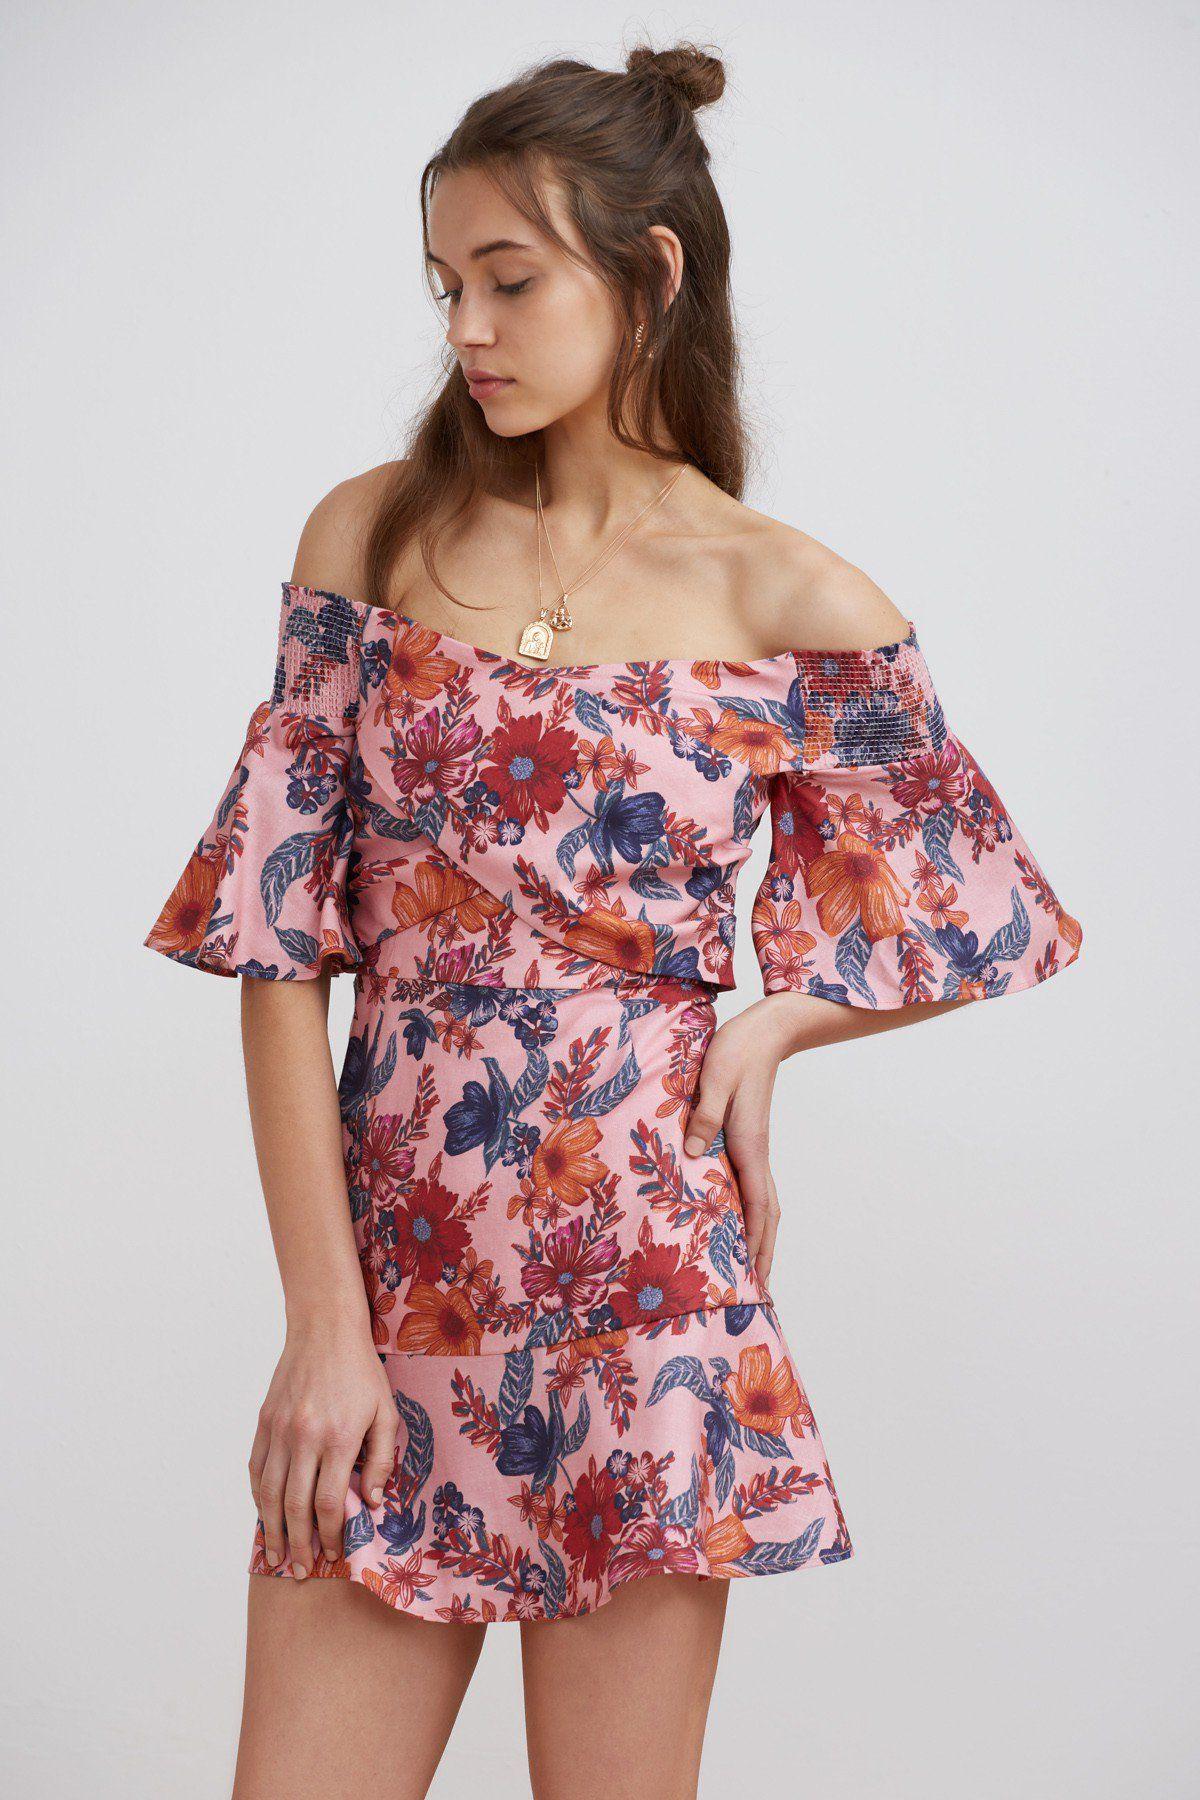 f58501aff7 RHAPSODY MINI DRESS, Finders Keepers $189.95 http://www.shopyou.com